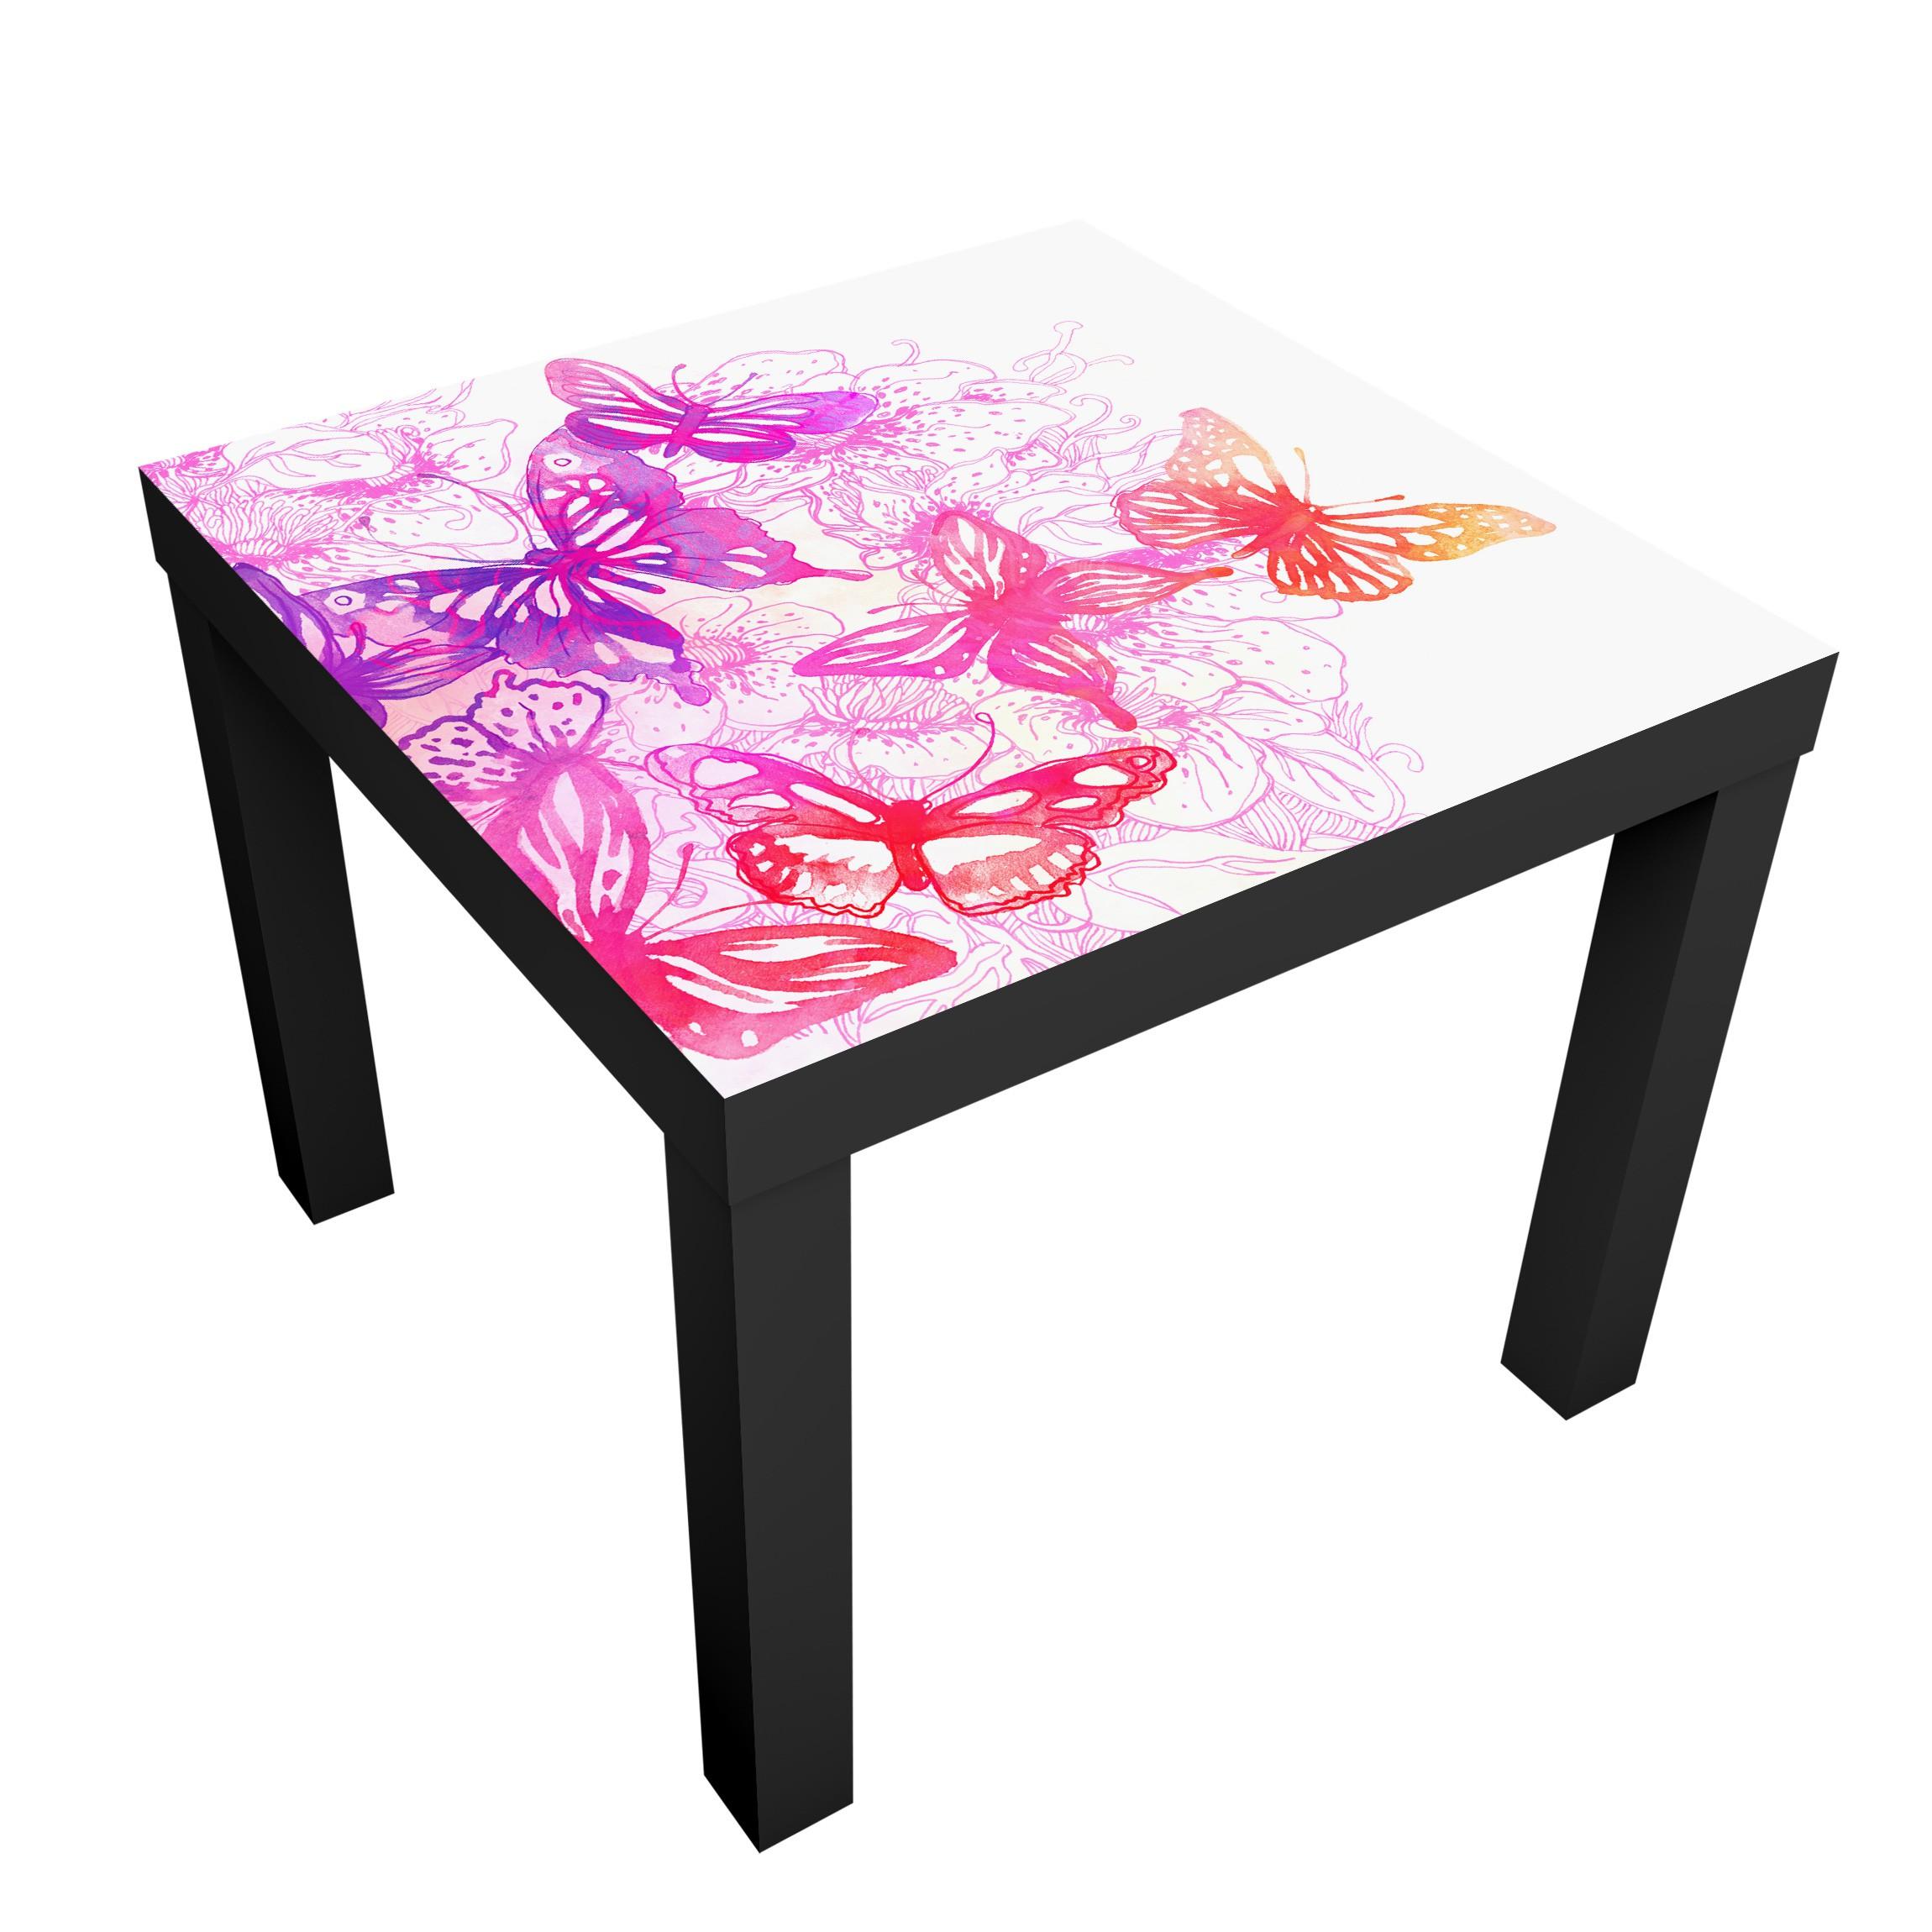 Carta adesiva per mobili ikea lack tavolino butterfly dream - Ikea lack tavolino ...